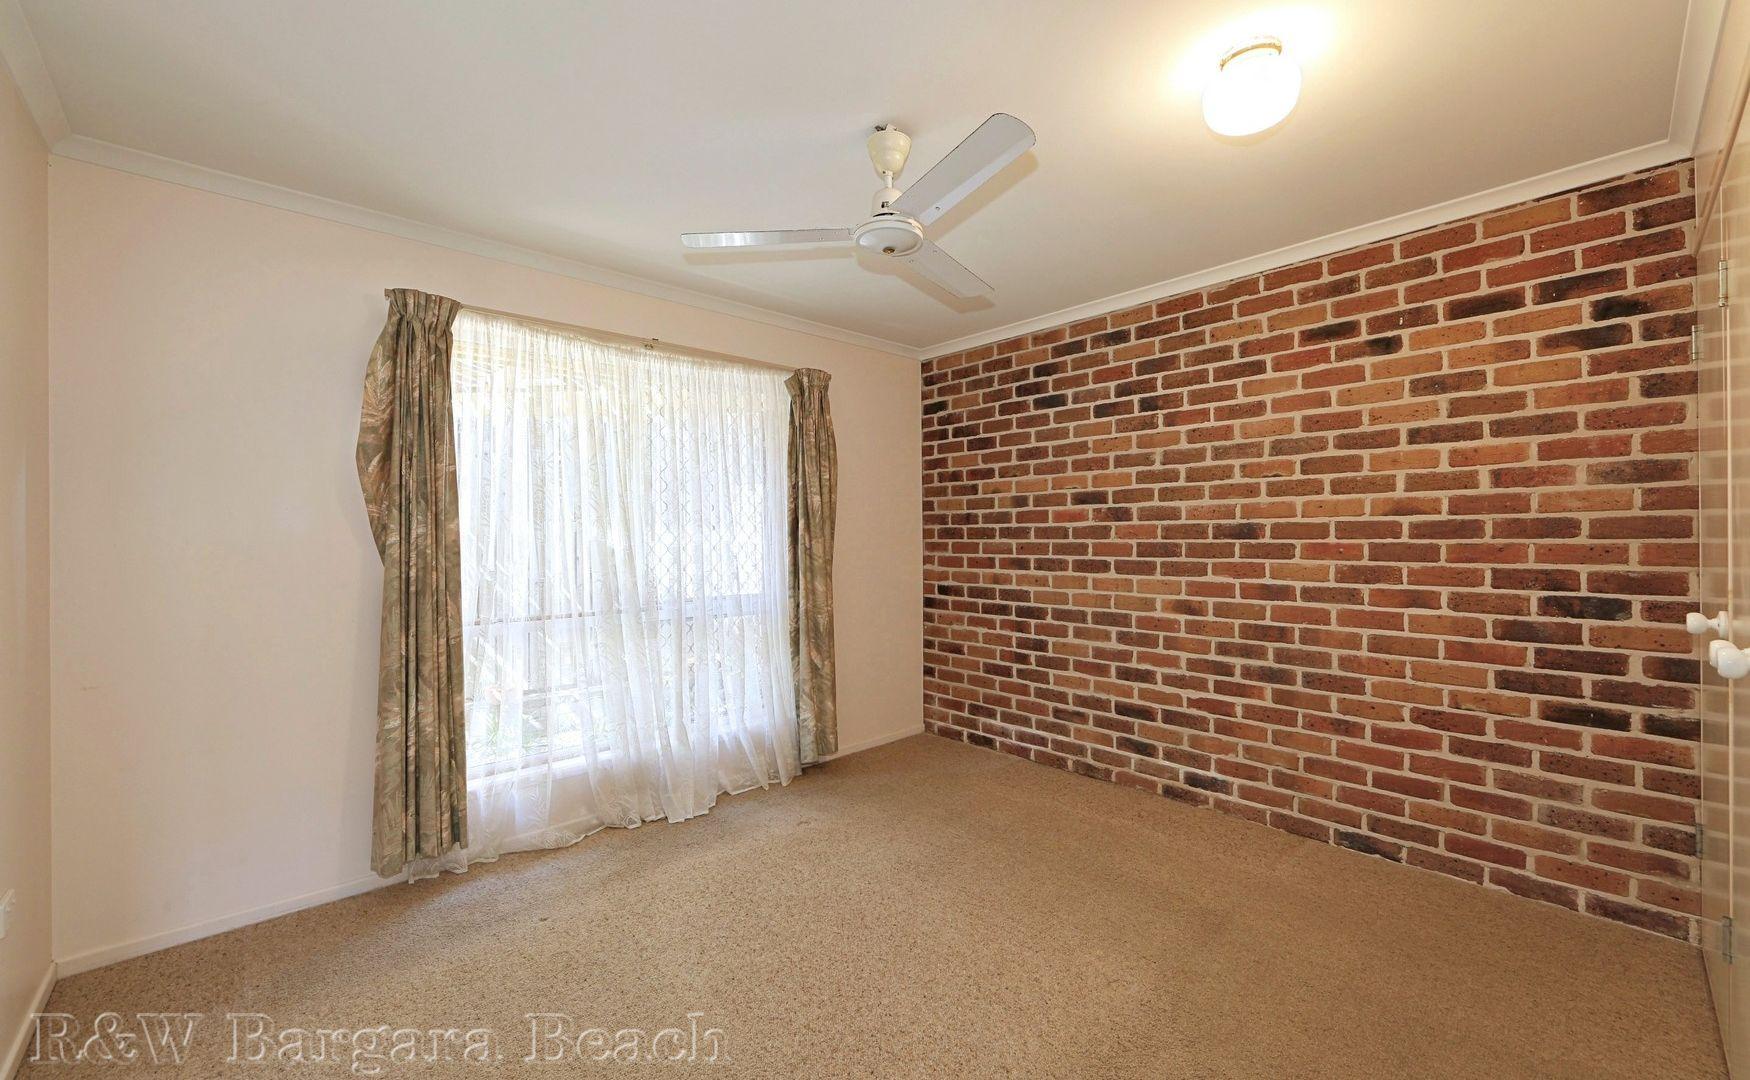 3/84 Woongarra Scenic Drive, Bargara QLD 4670, Image 2